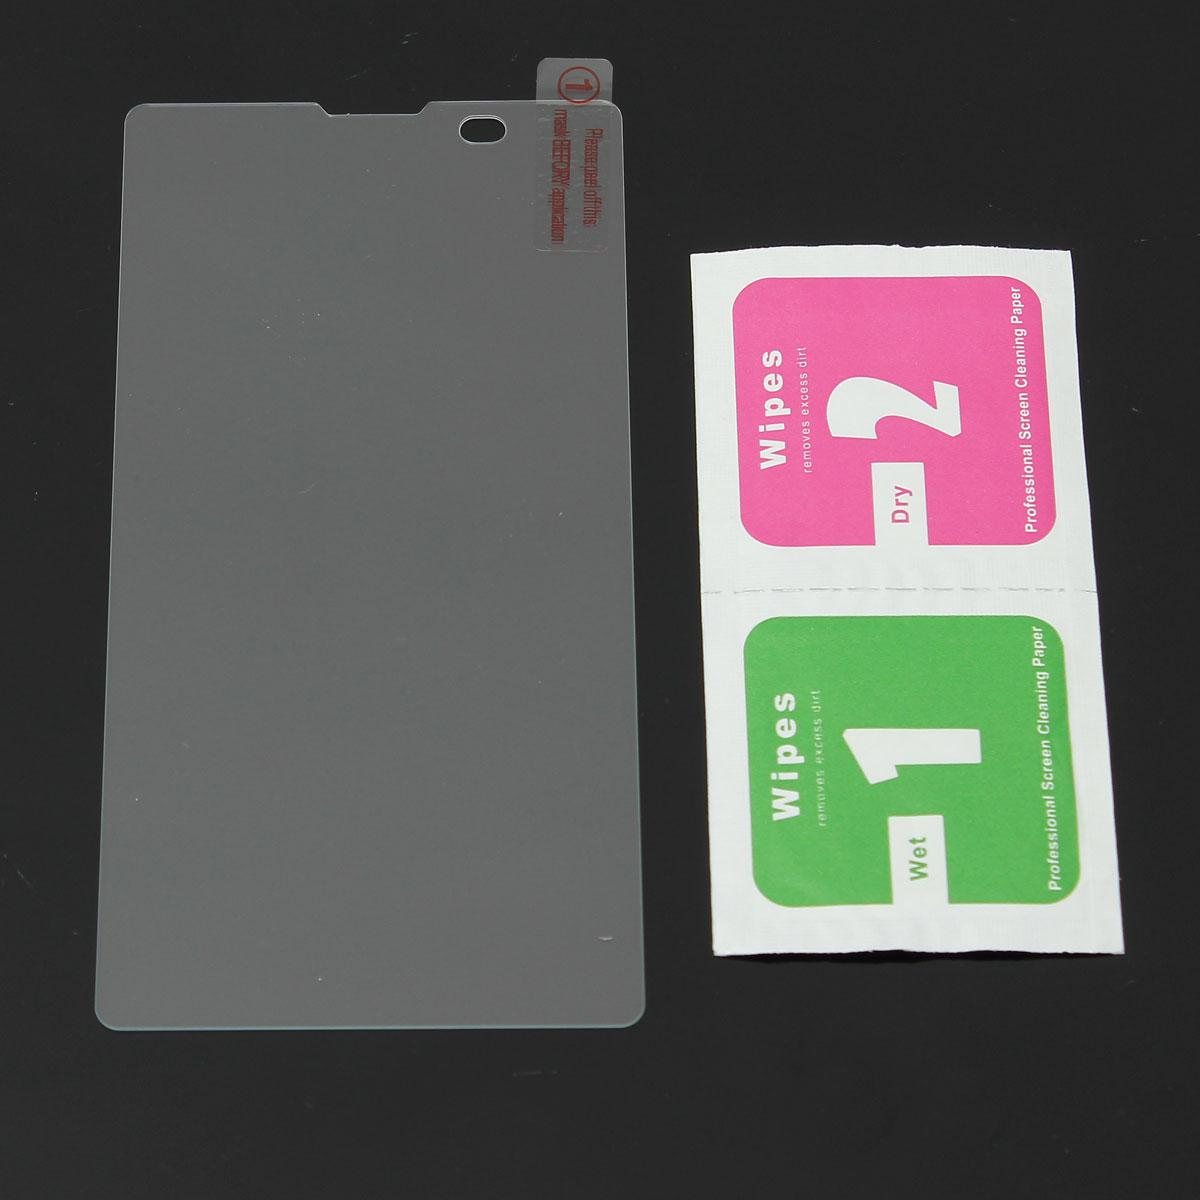 RealЗакаленноестеклоэкранателефонапротектор для XiaomiRedmi1S - 1TopShop